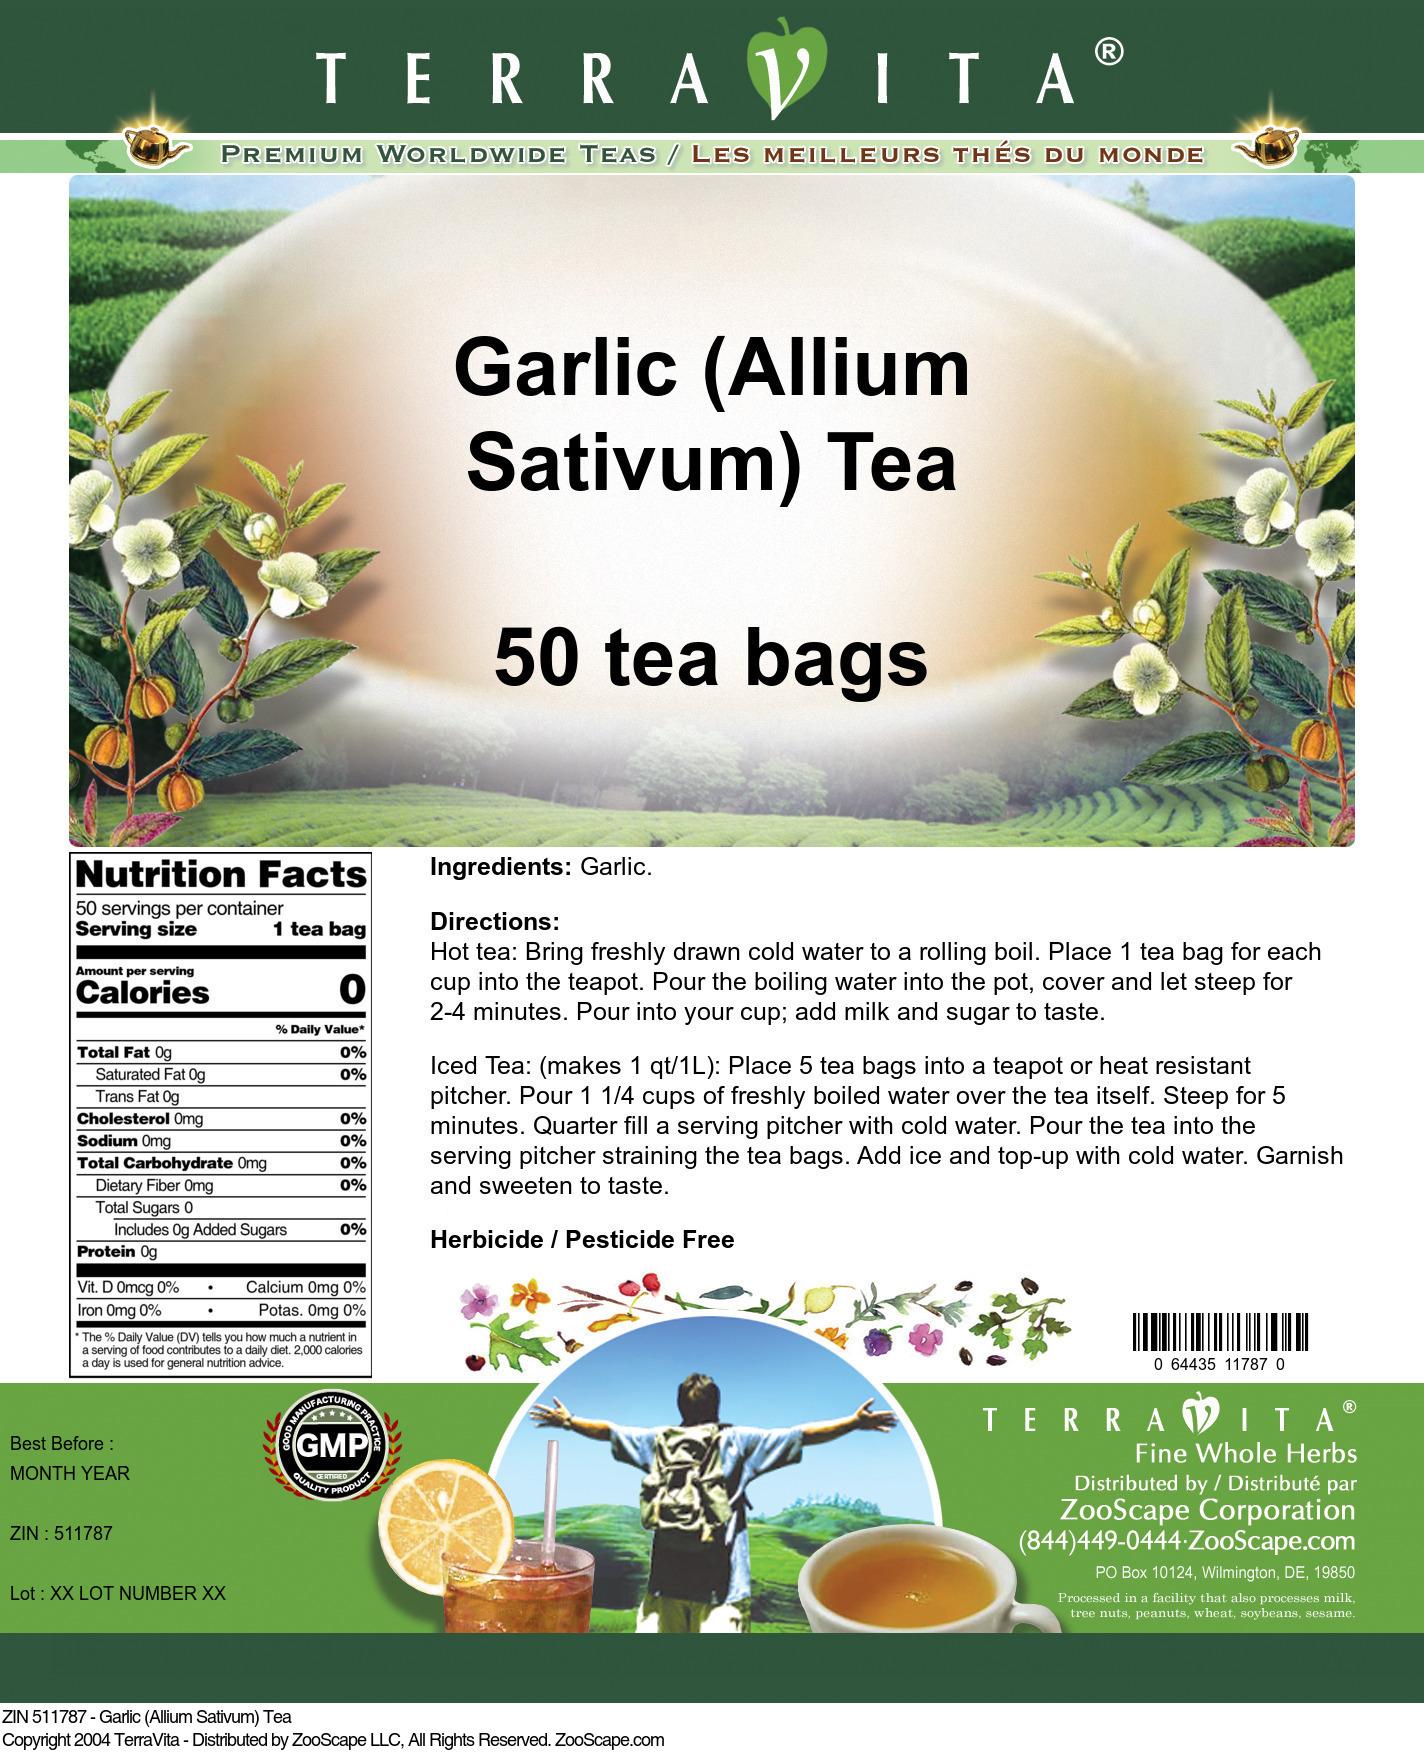 Garlic (Allium Sativum) Tea